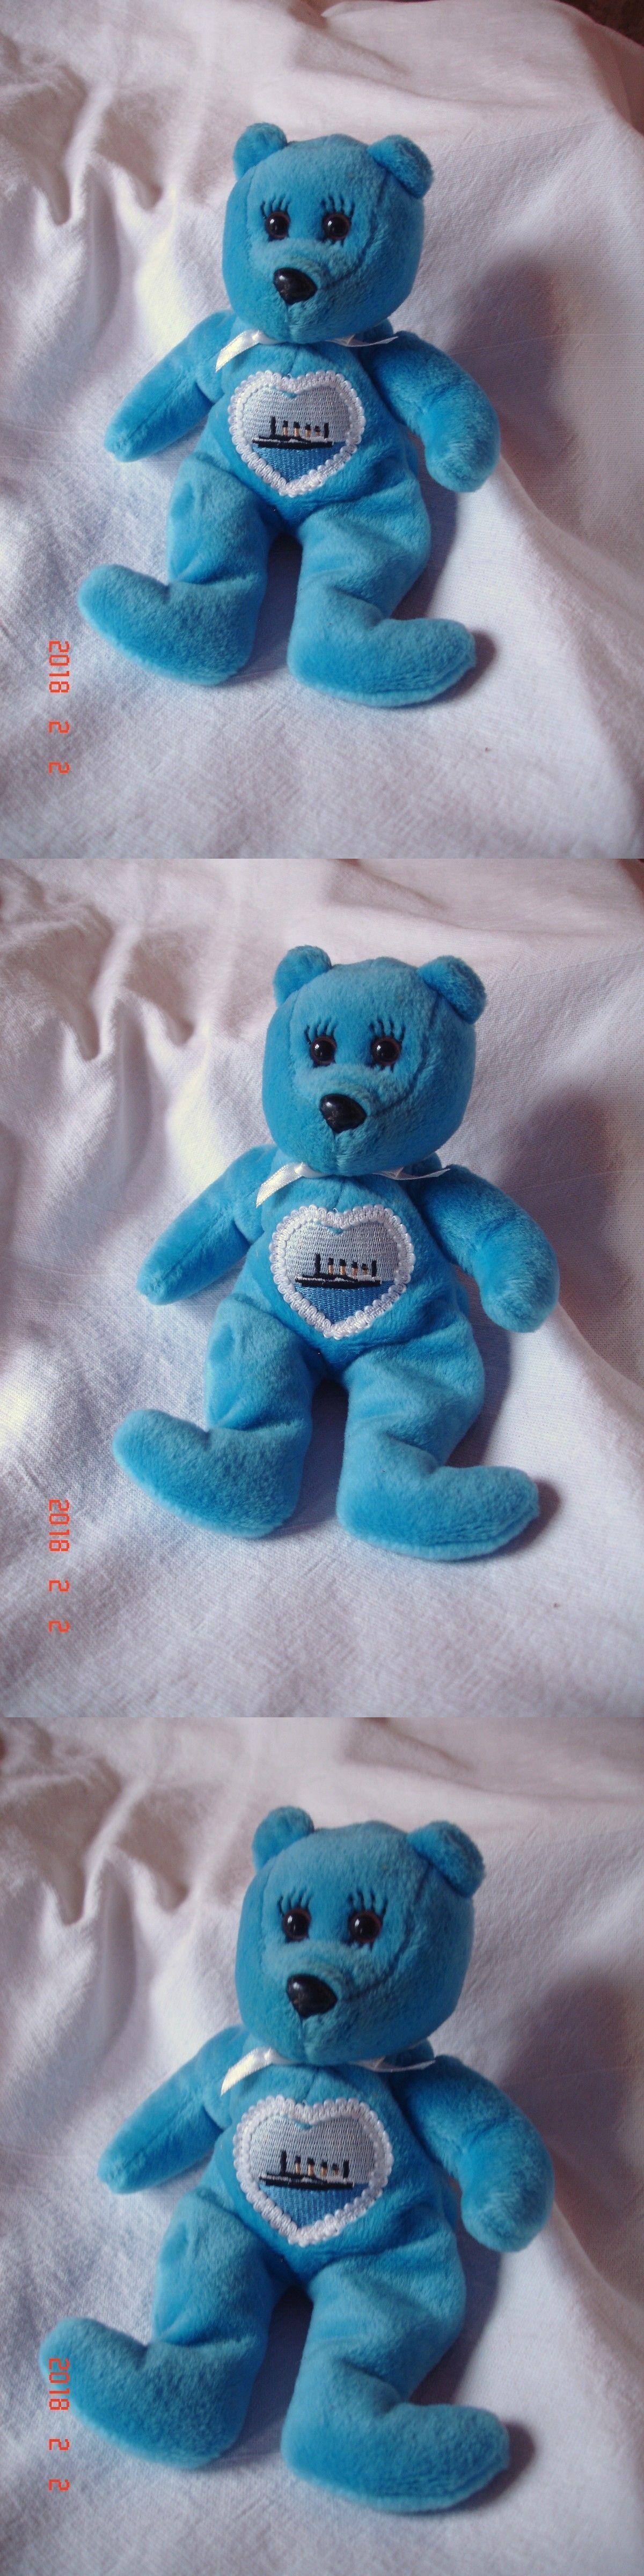 Pin On Celebrity Bears 49021